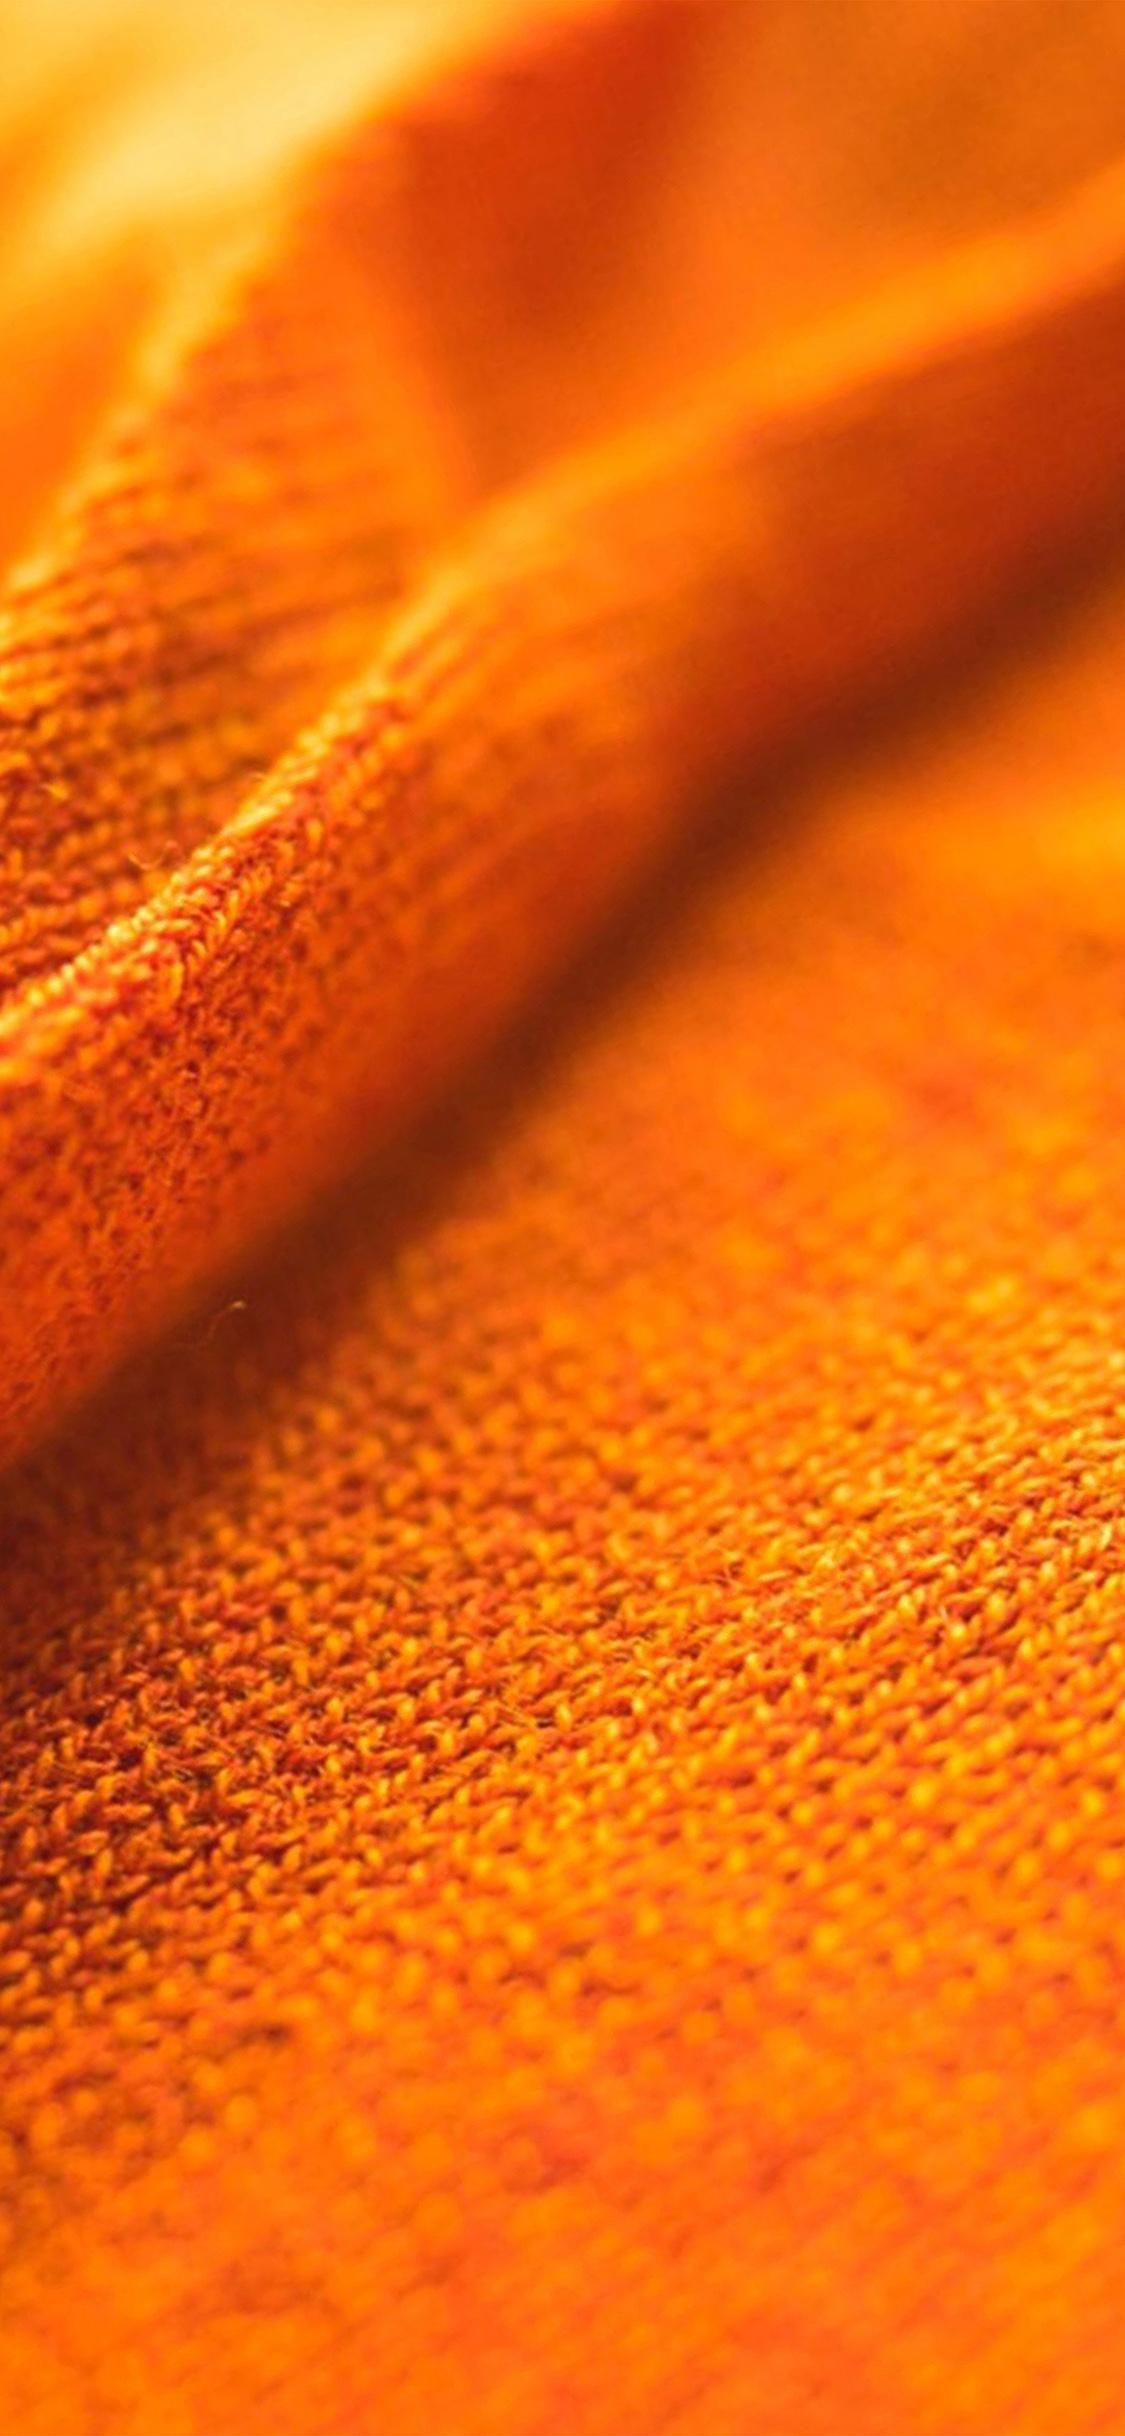 Orange Iphone Wallpapers Wallpaper Cave